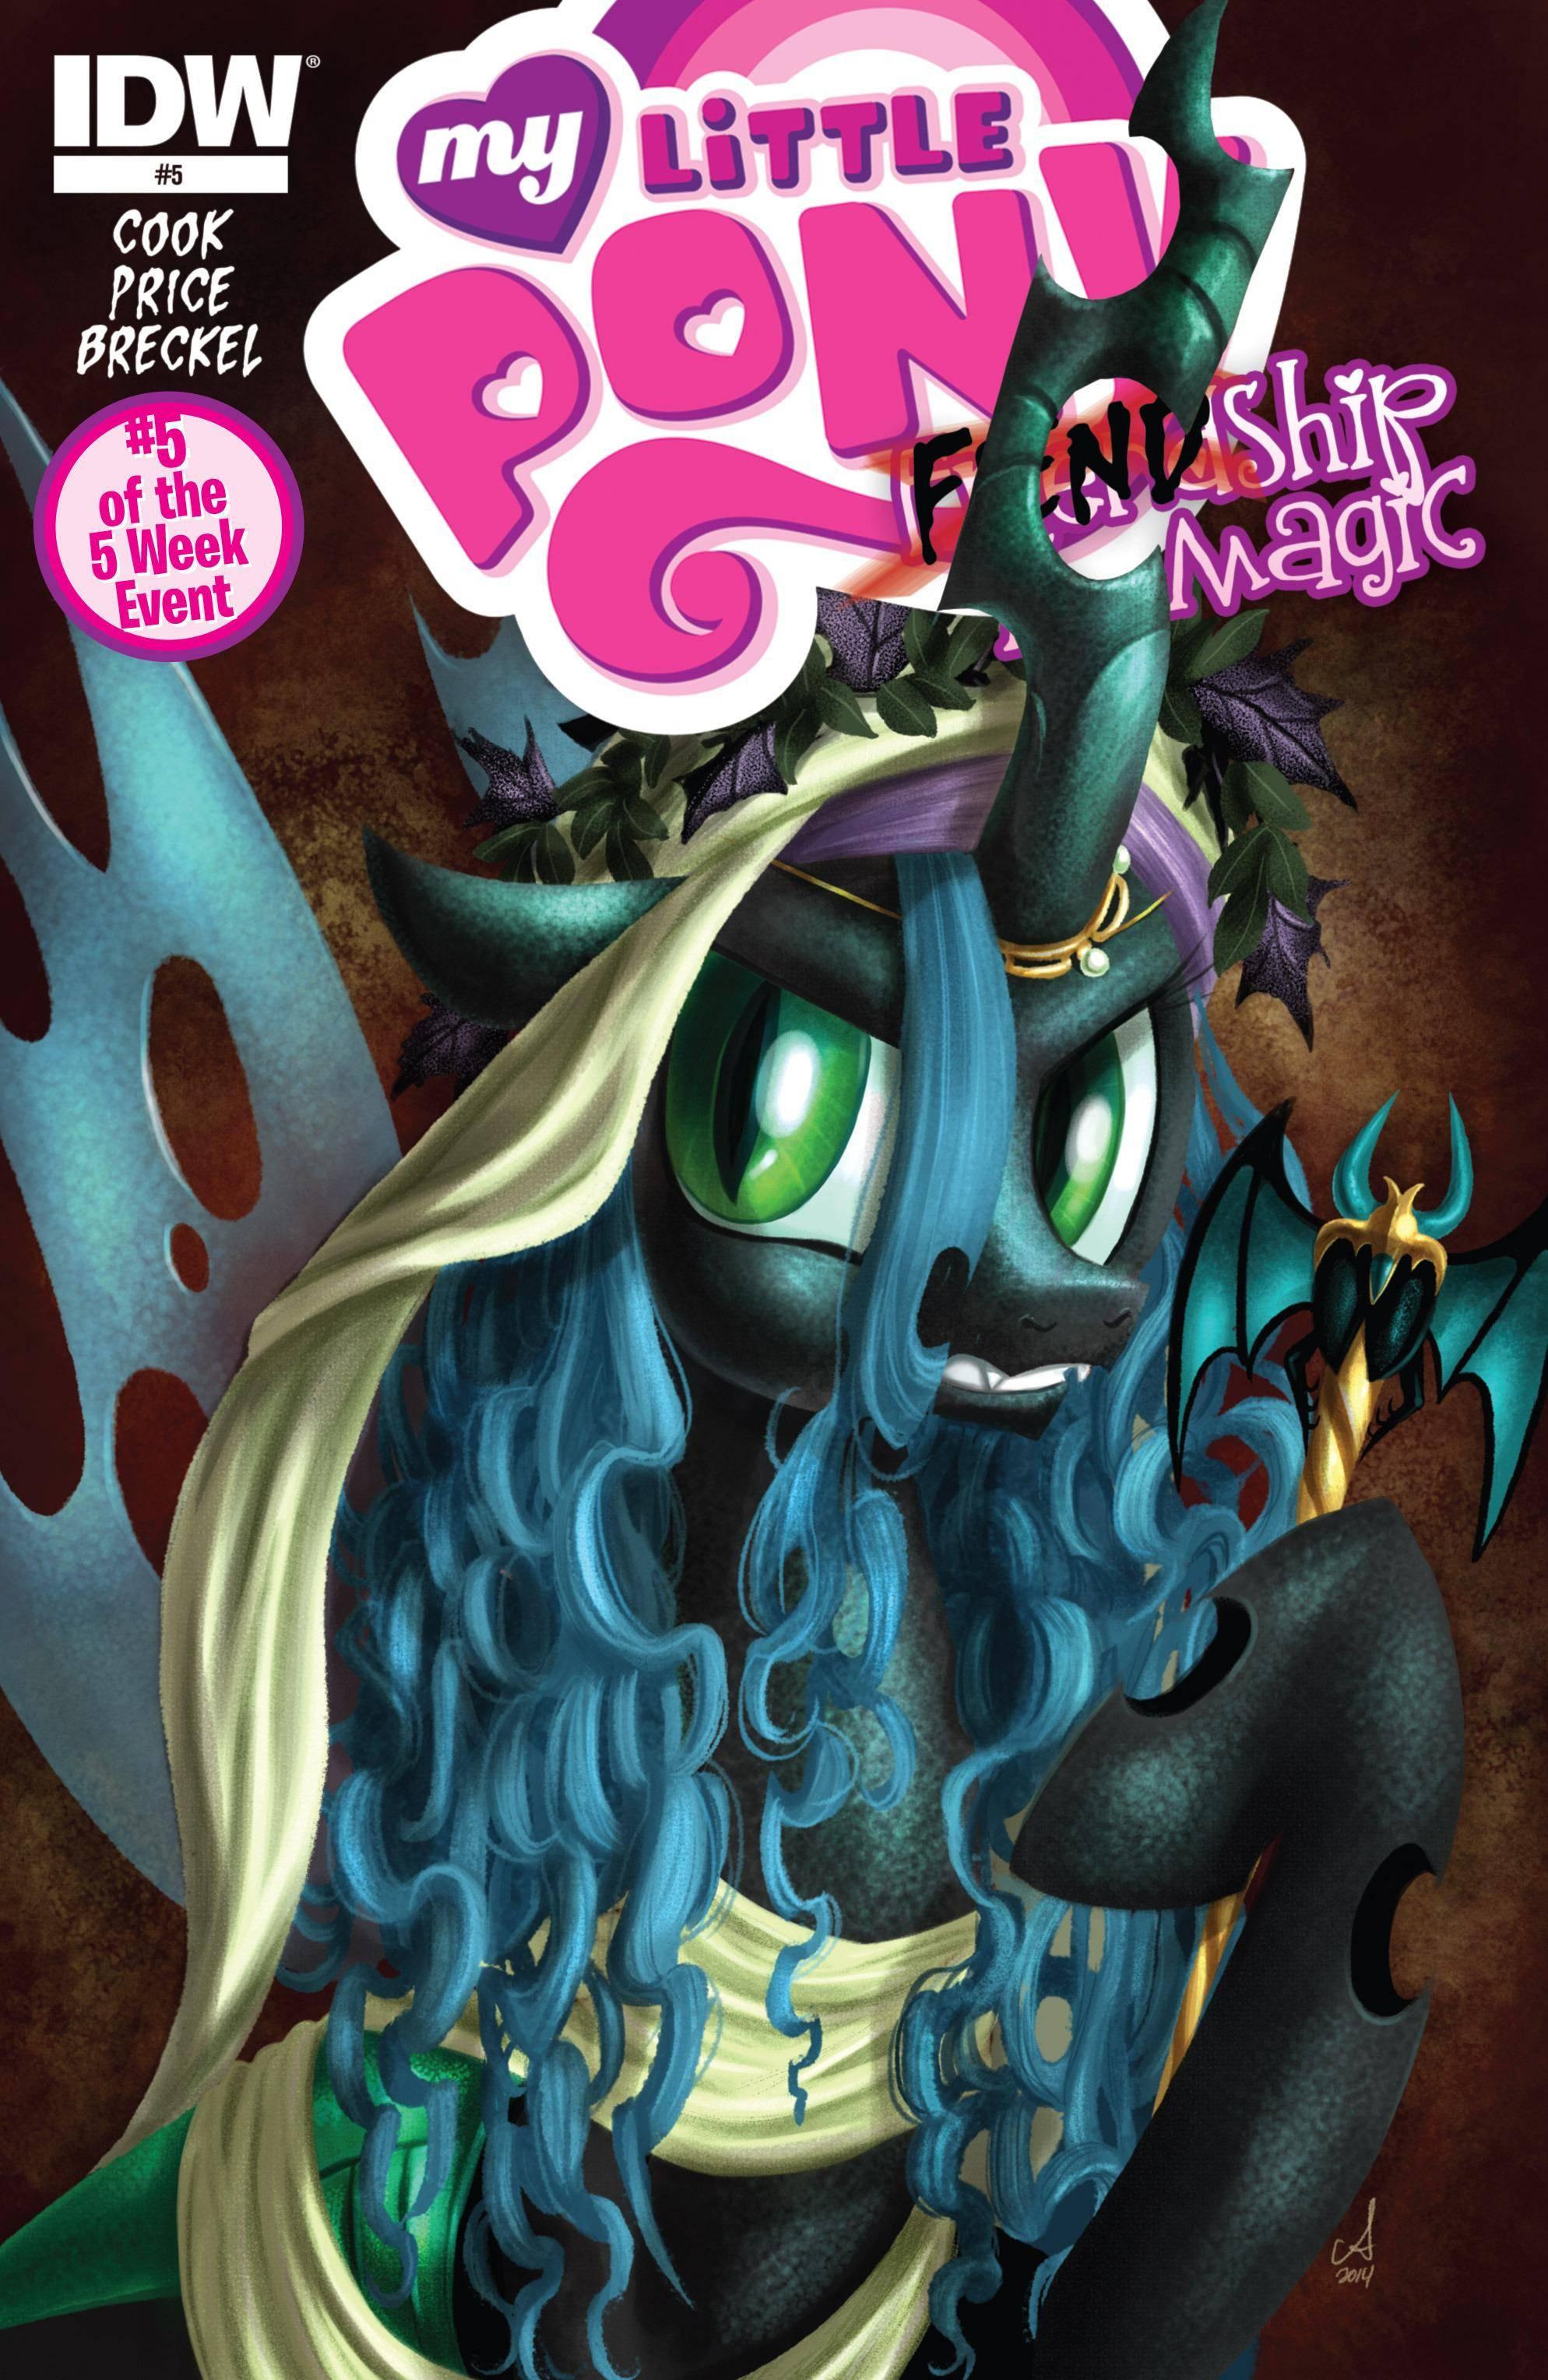 My Little Pony- FIENDship is Magic 005 - Queen Chrysalis 2015 digital